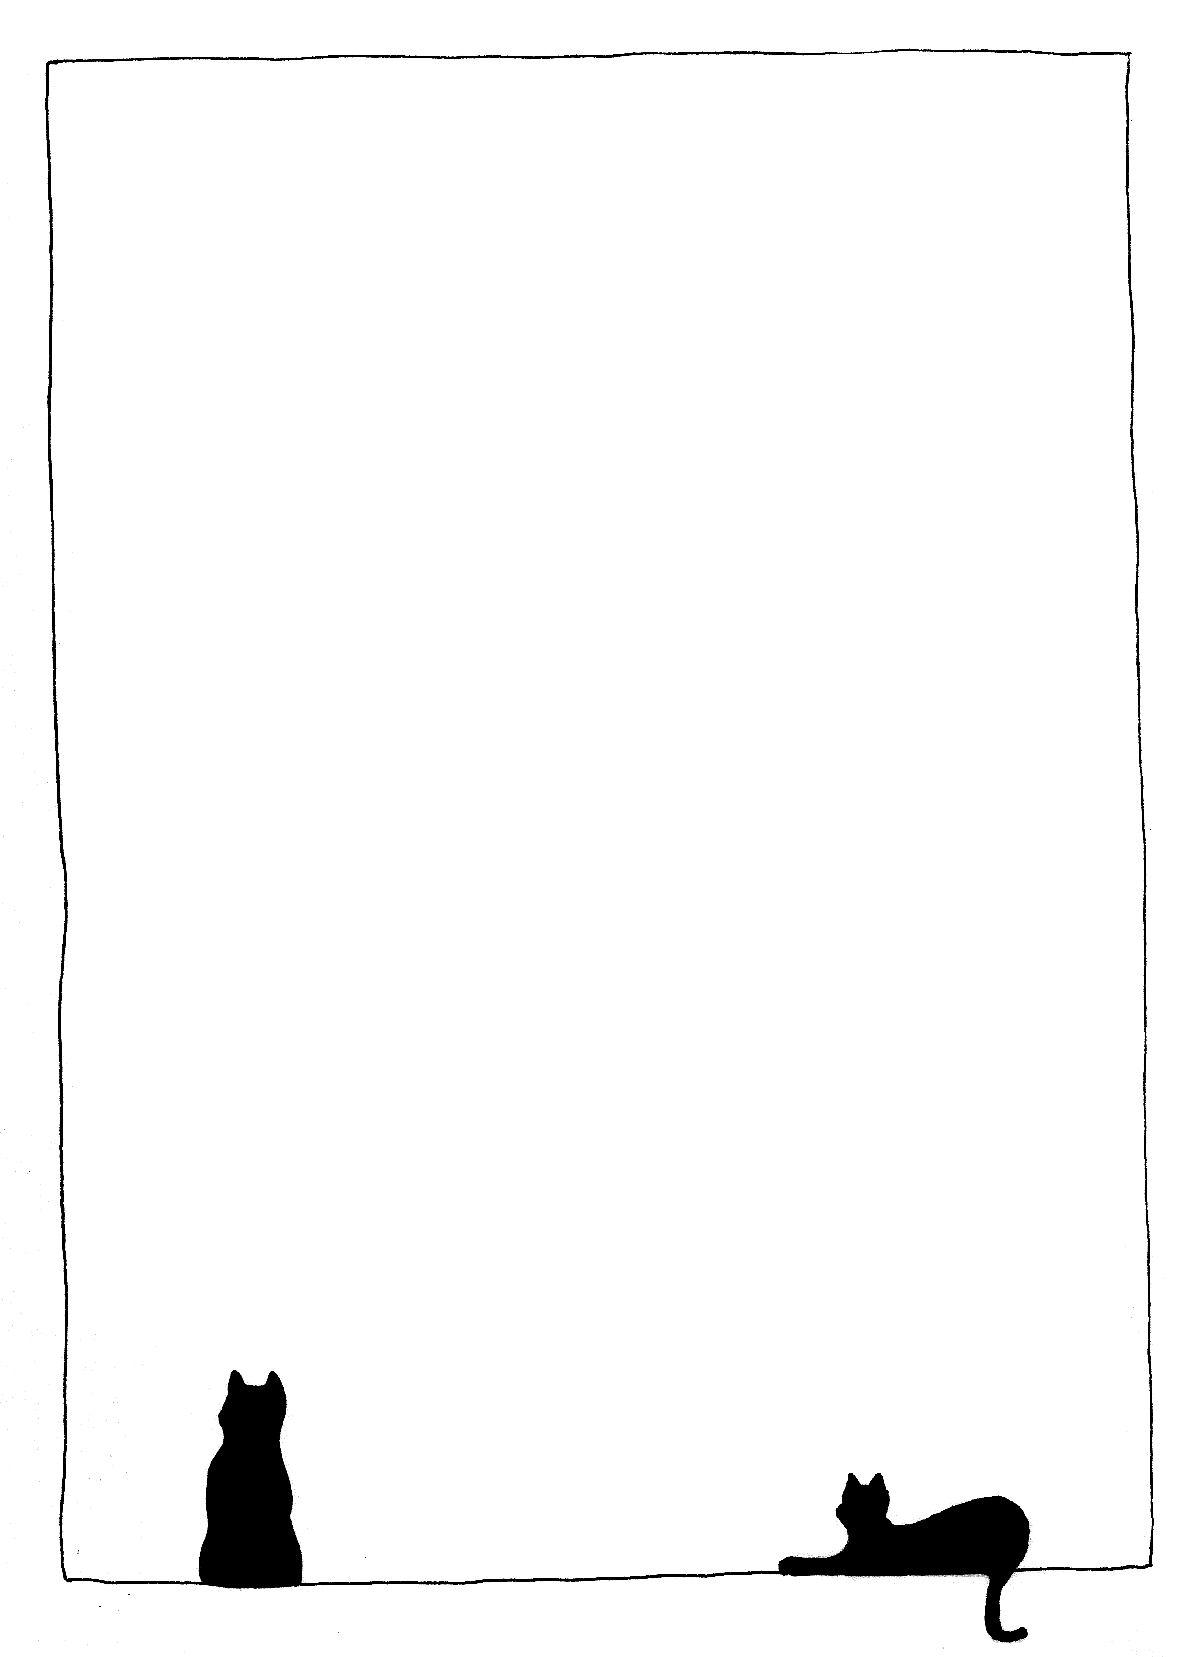 Kitten Clip Art Music Notes Border Cli...